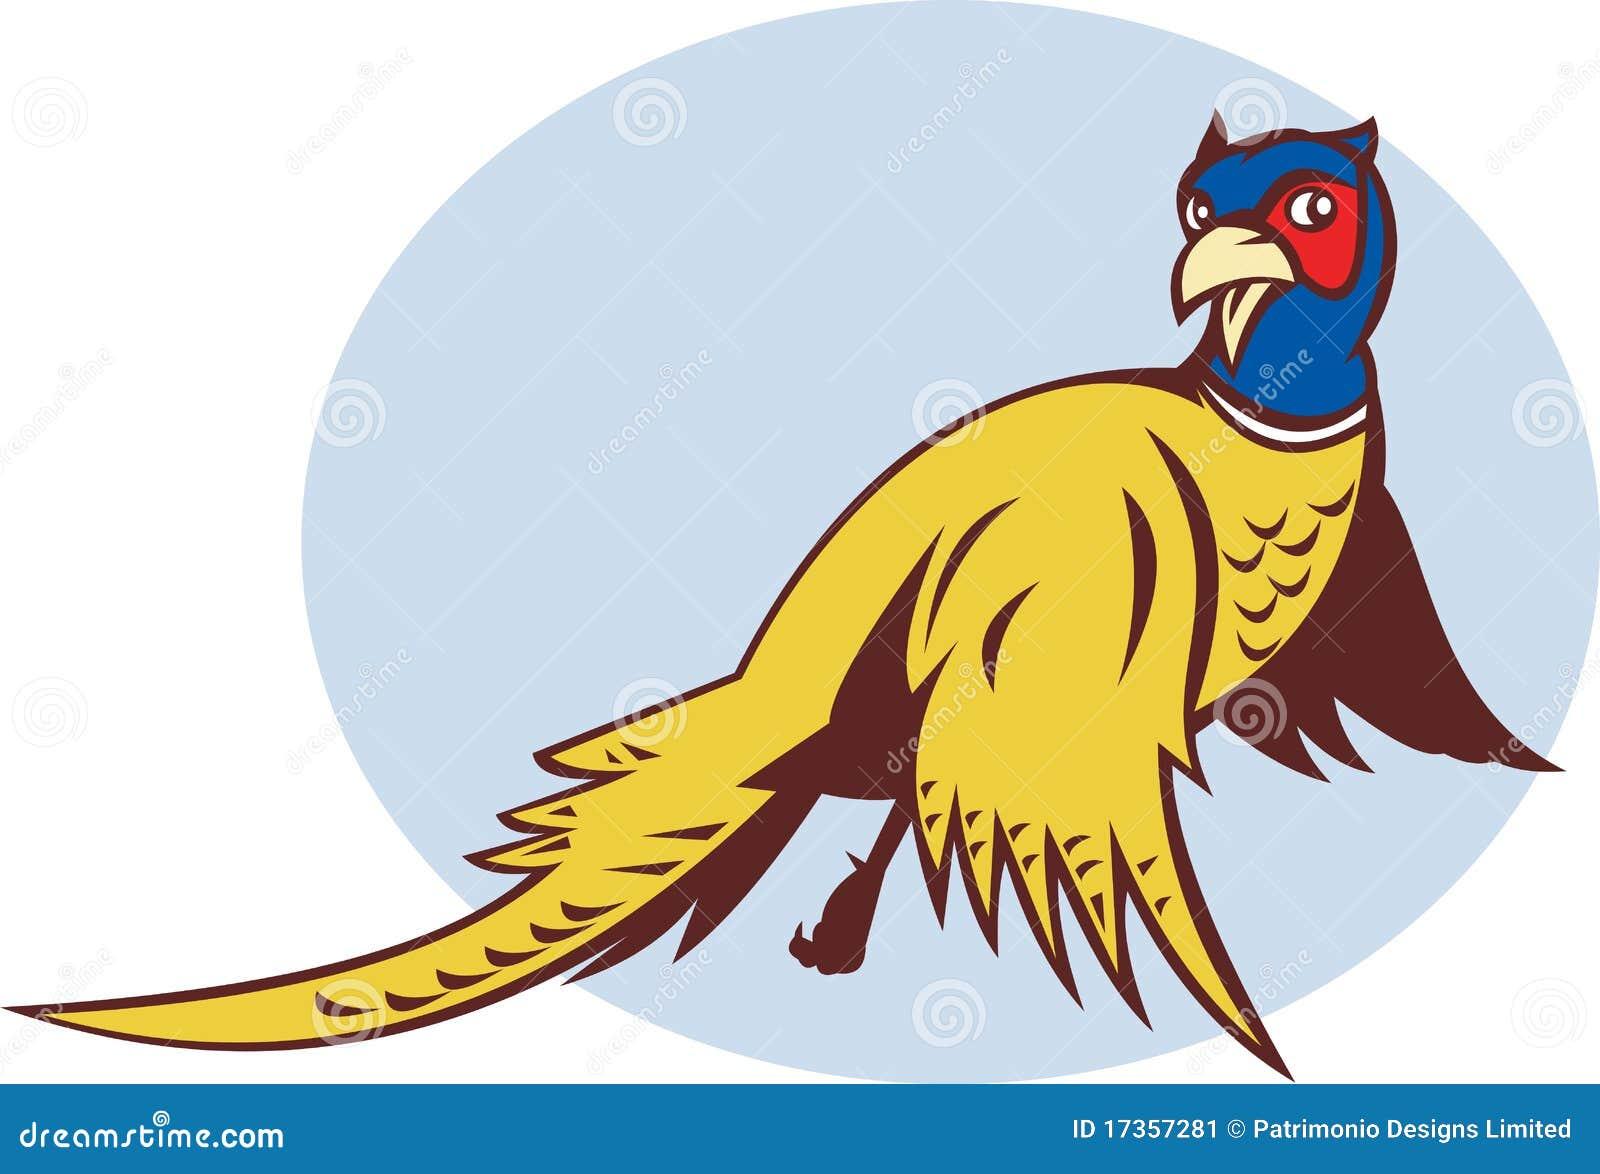 Cartoon Pheasant Bird Flying Stock Image - Image: 17357281